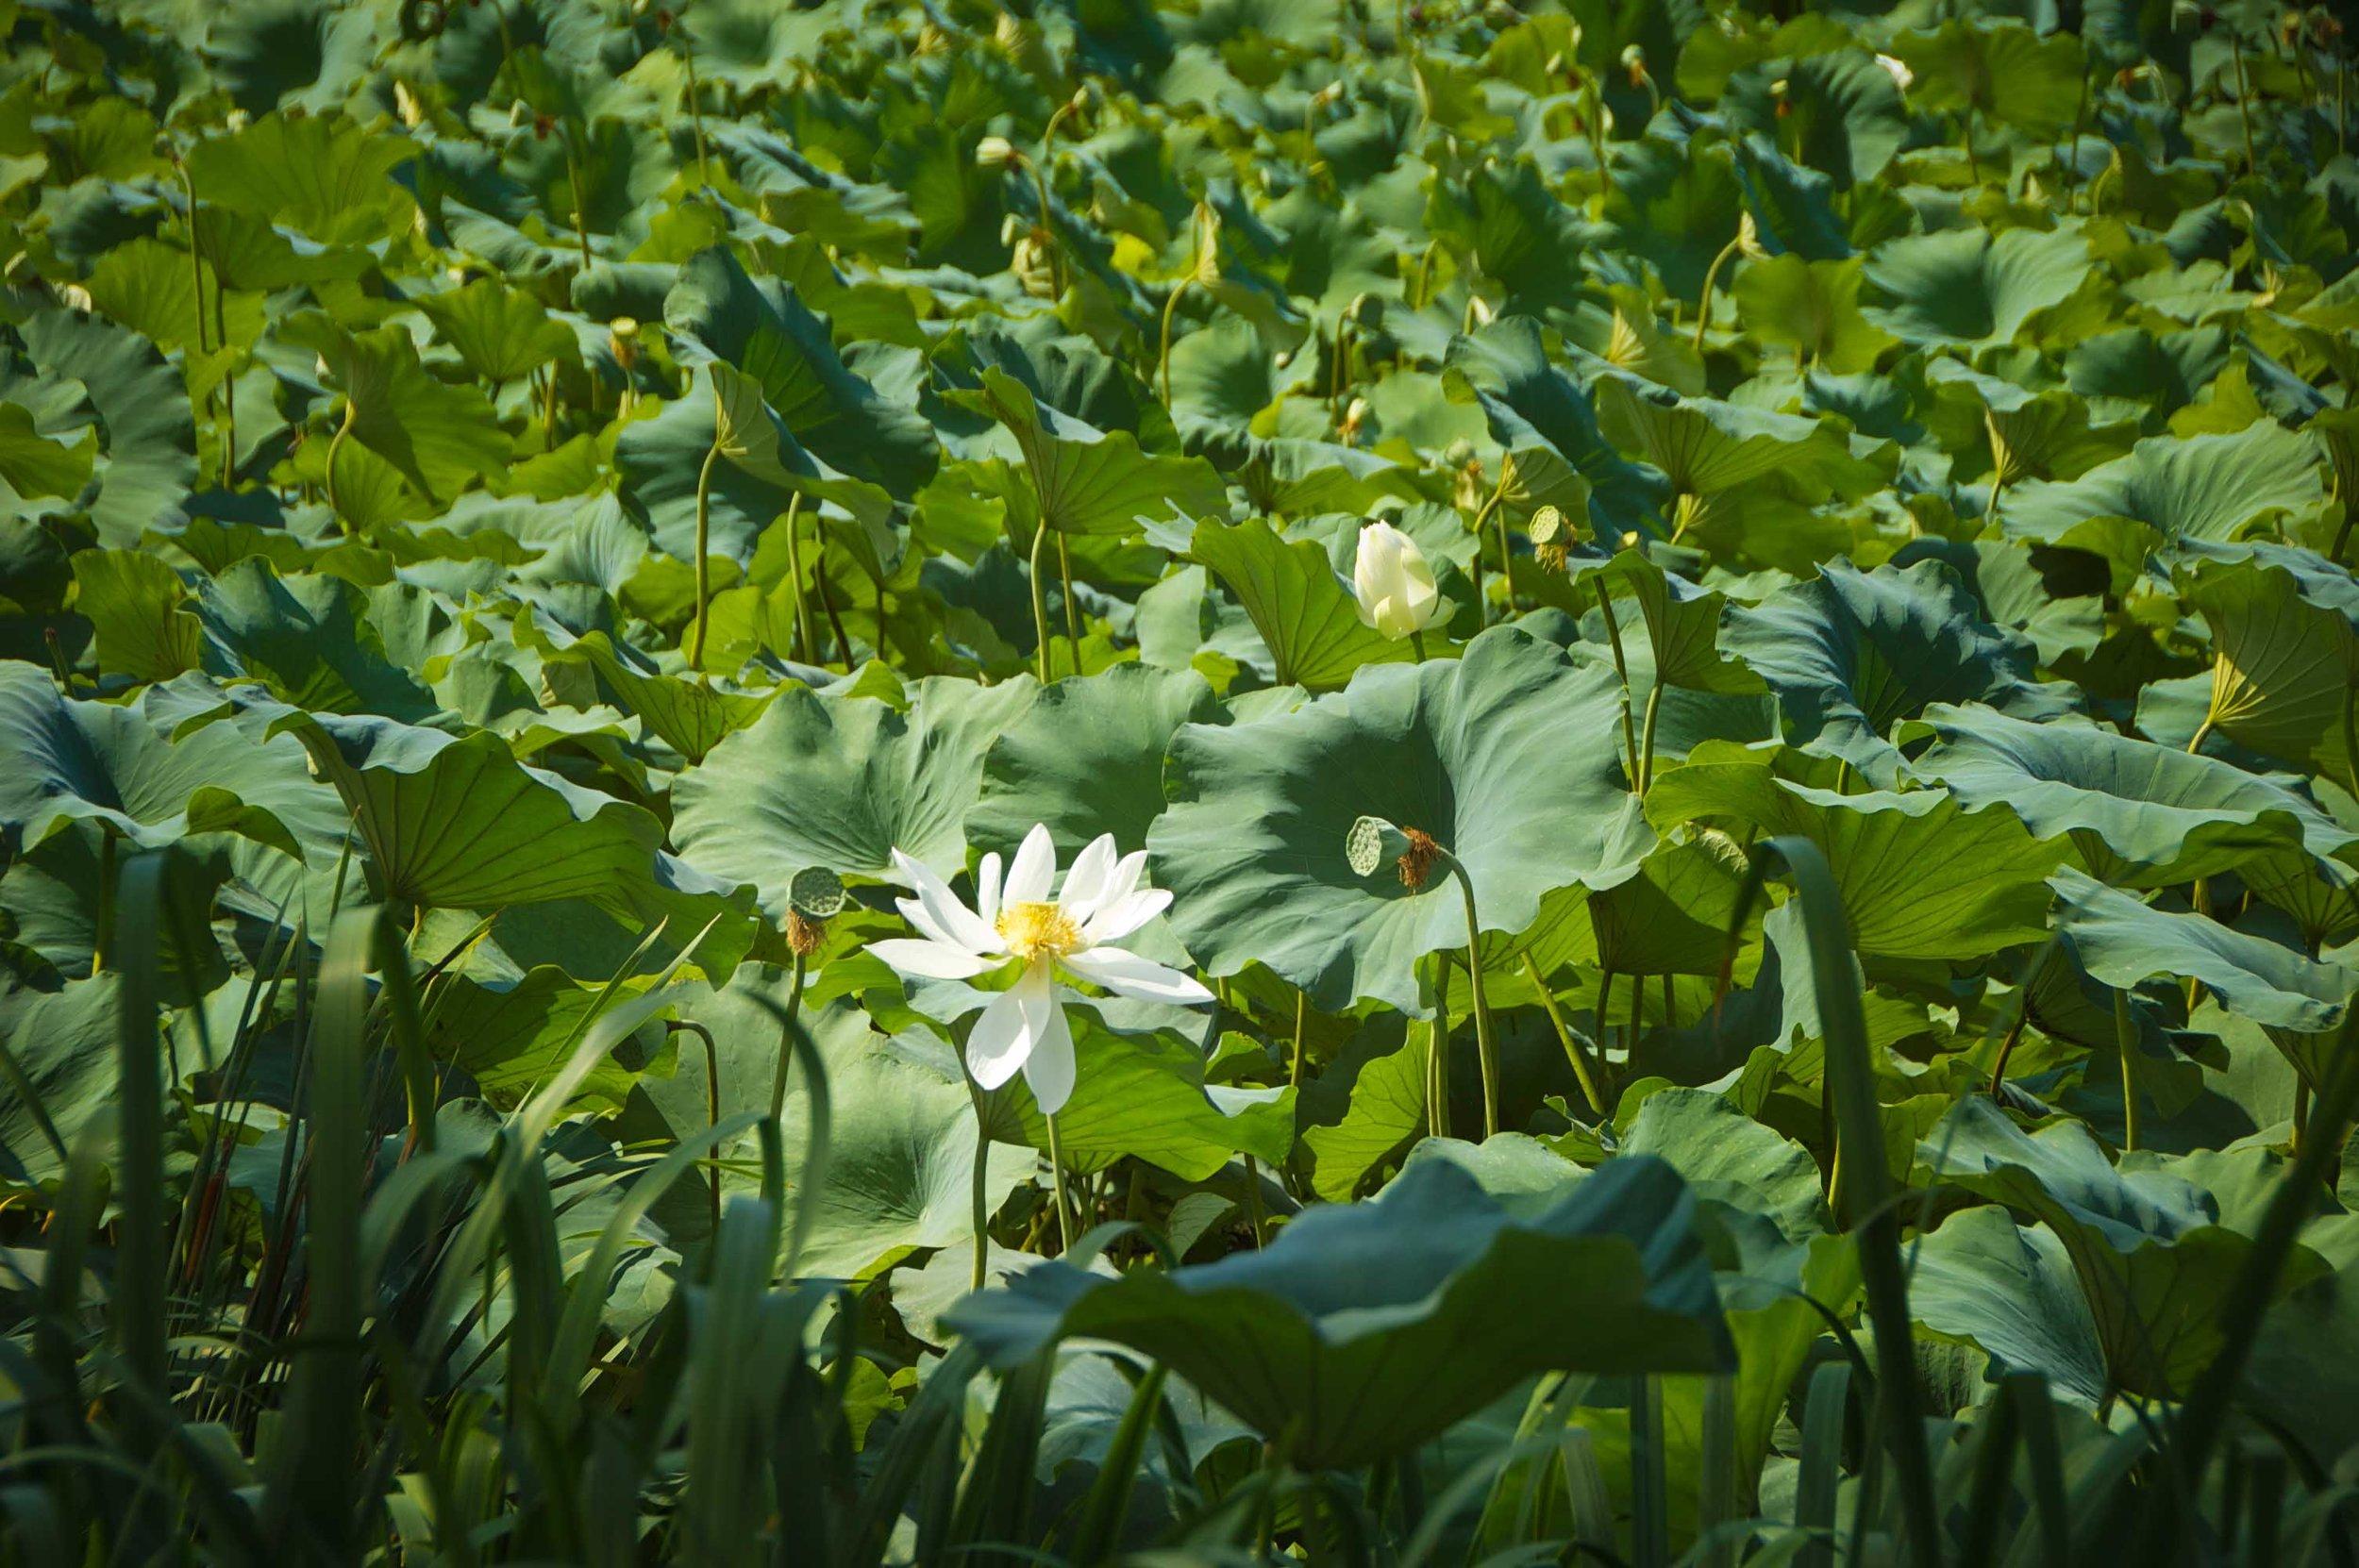 Andong, Korea lotus field